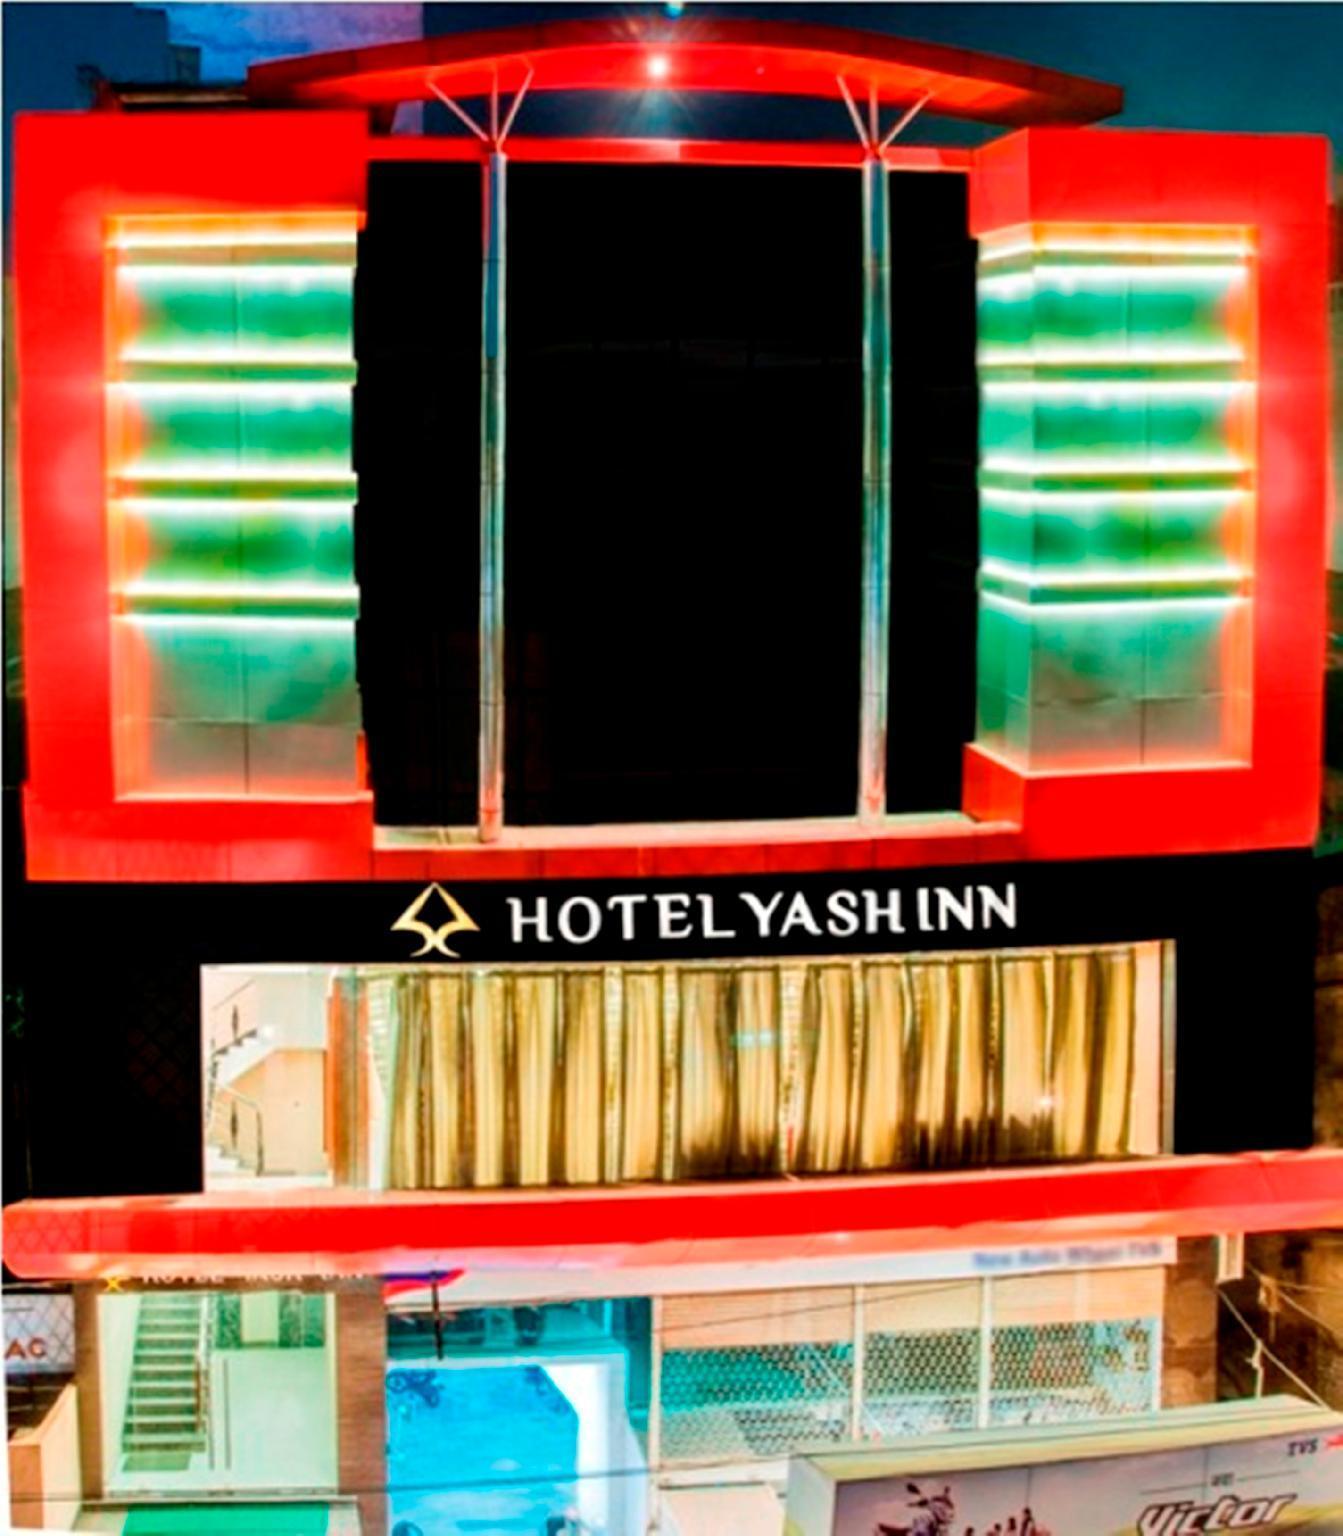 Hotel Yash Inn - Hotels in Mirzapur, Mirzapur